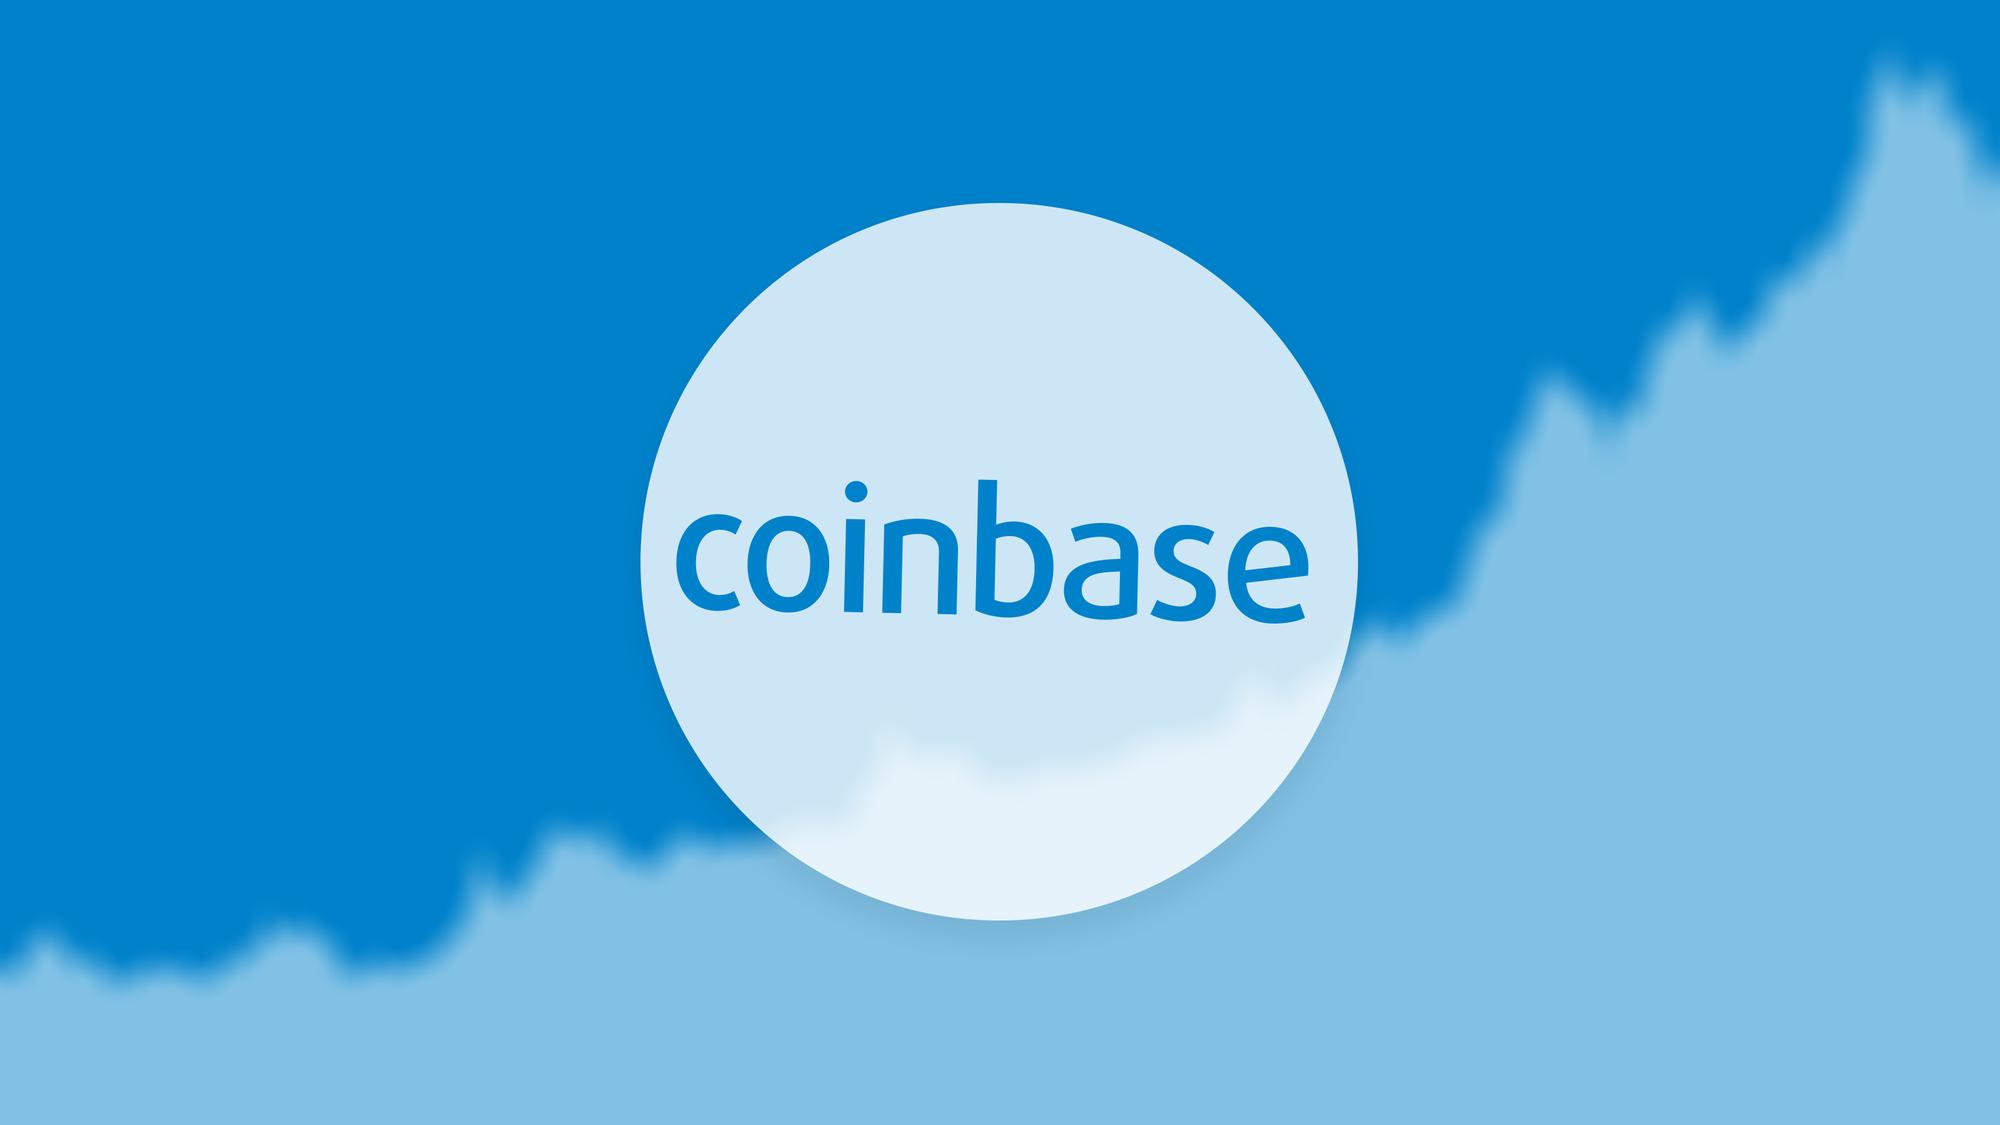 Coinbase首次发布透明度报告